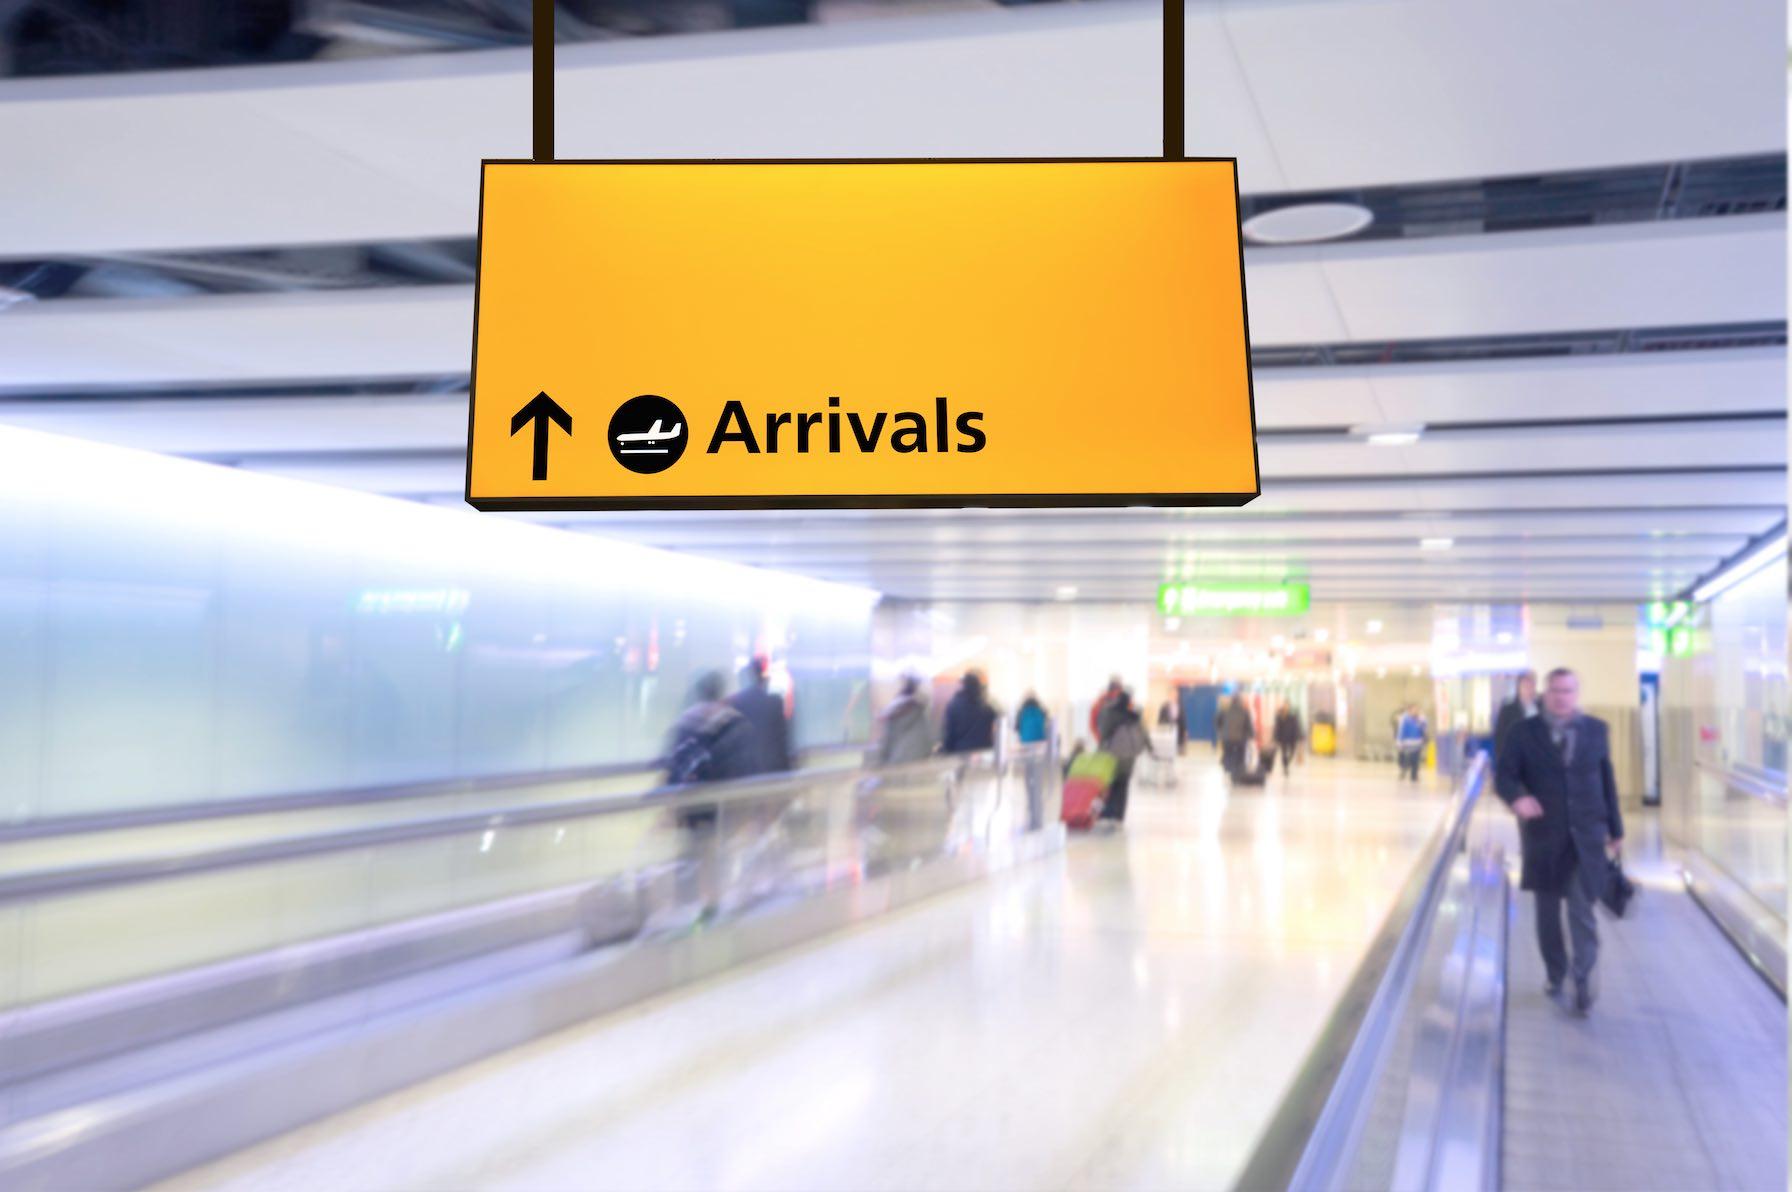 arrival.jpg - 139.92 kb